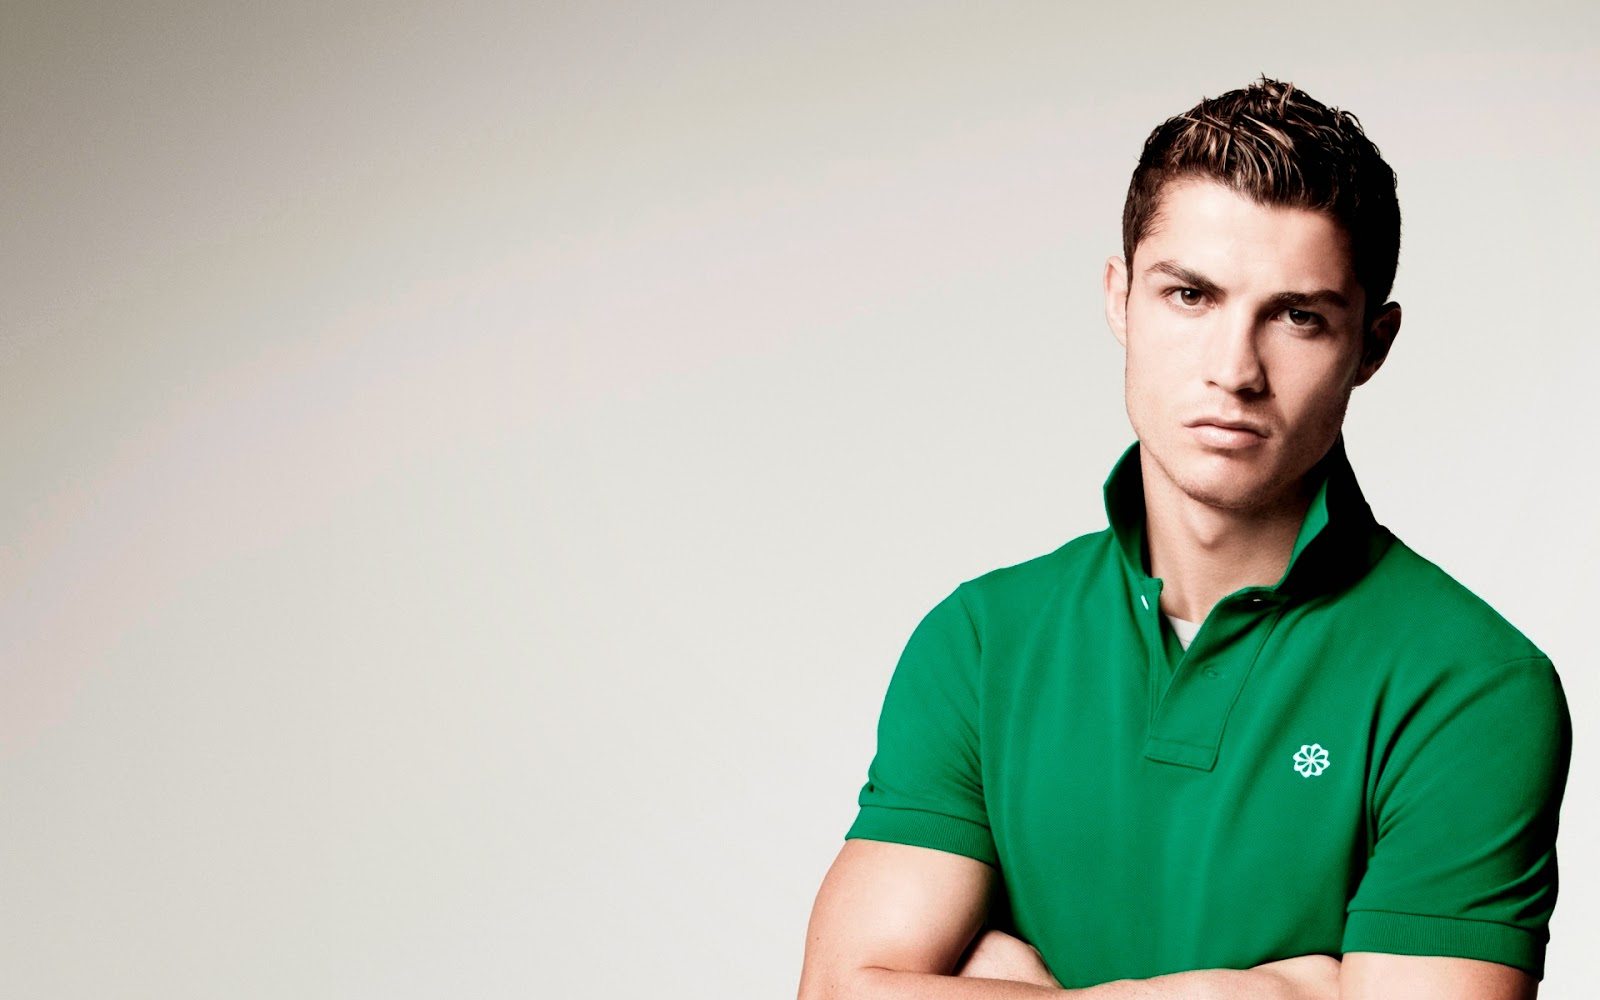 Foto Cristiano Ronaldo Terbaru Berita Terbaru